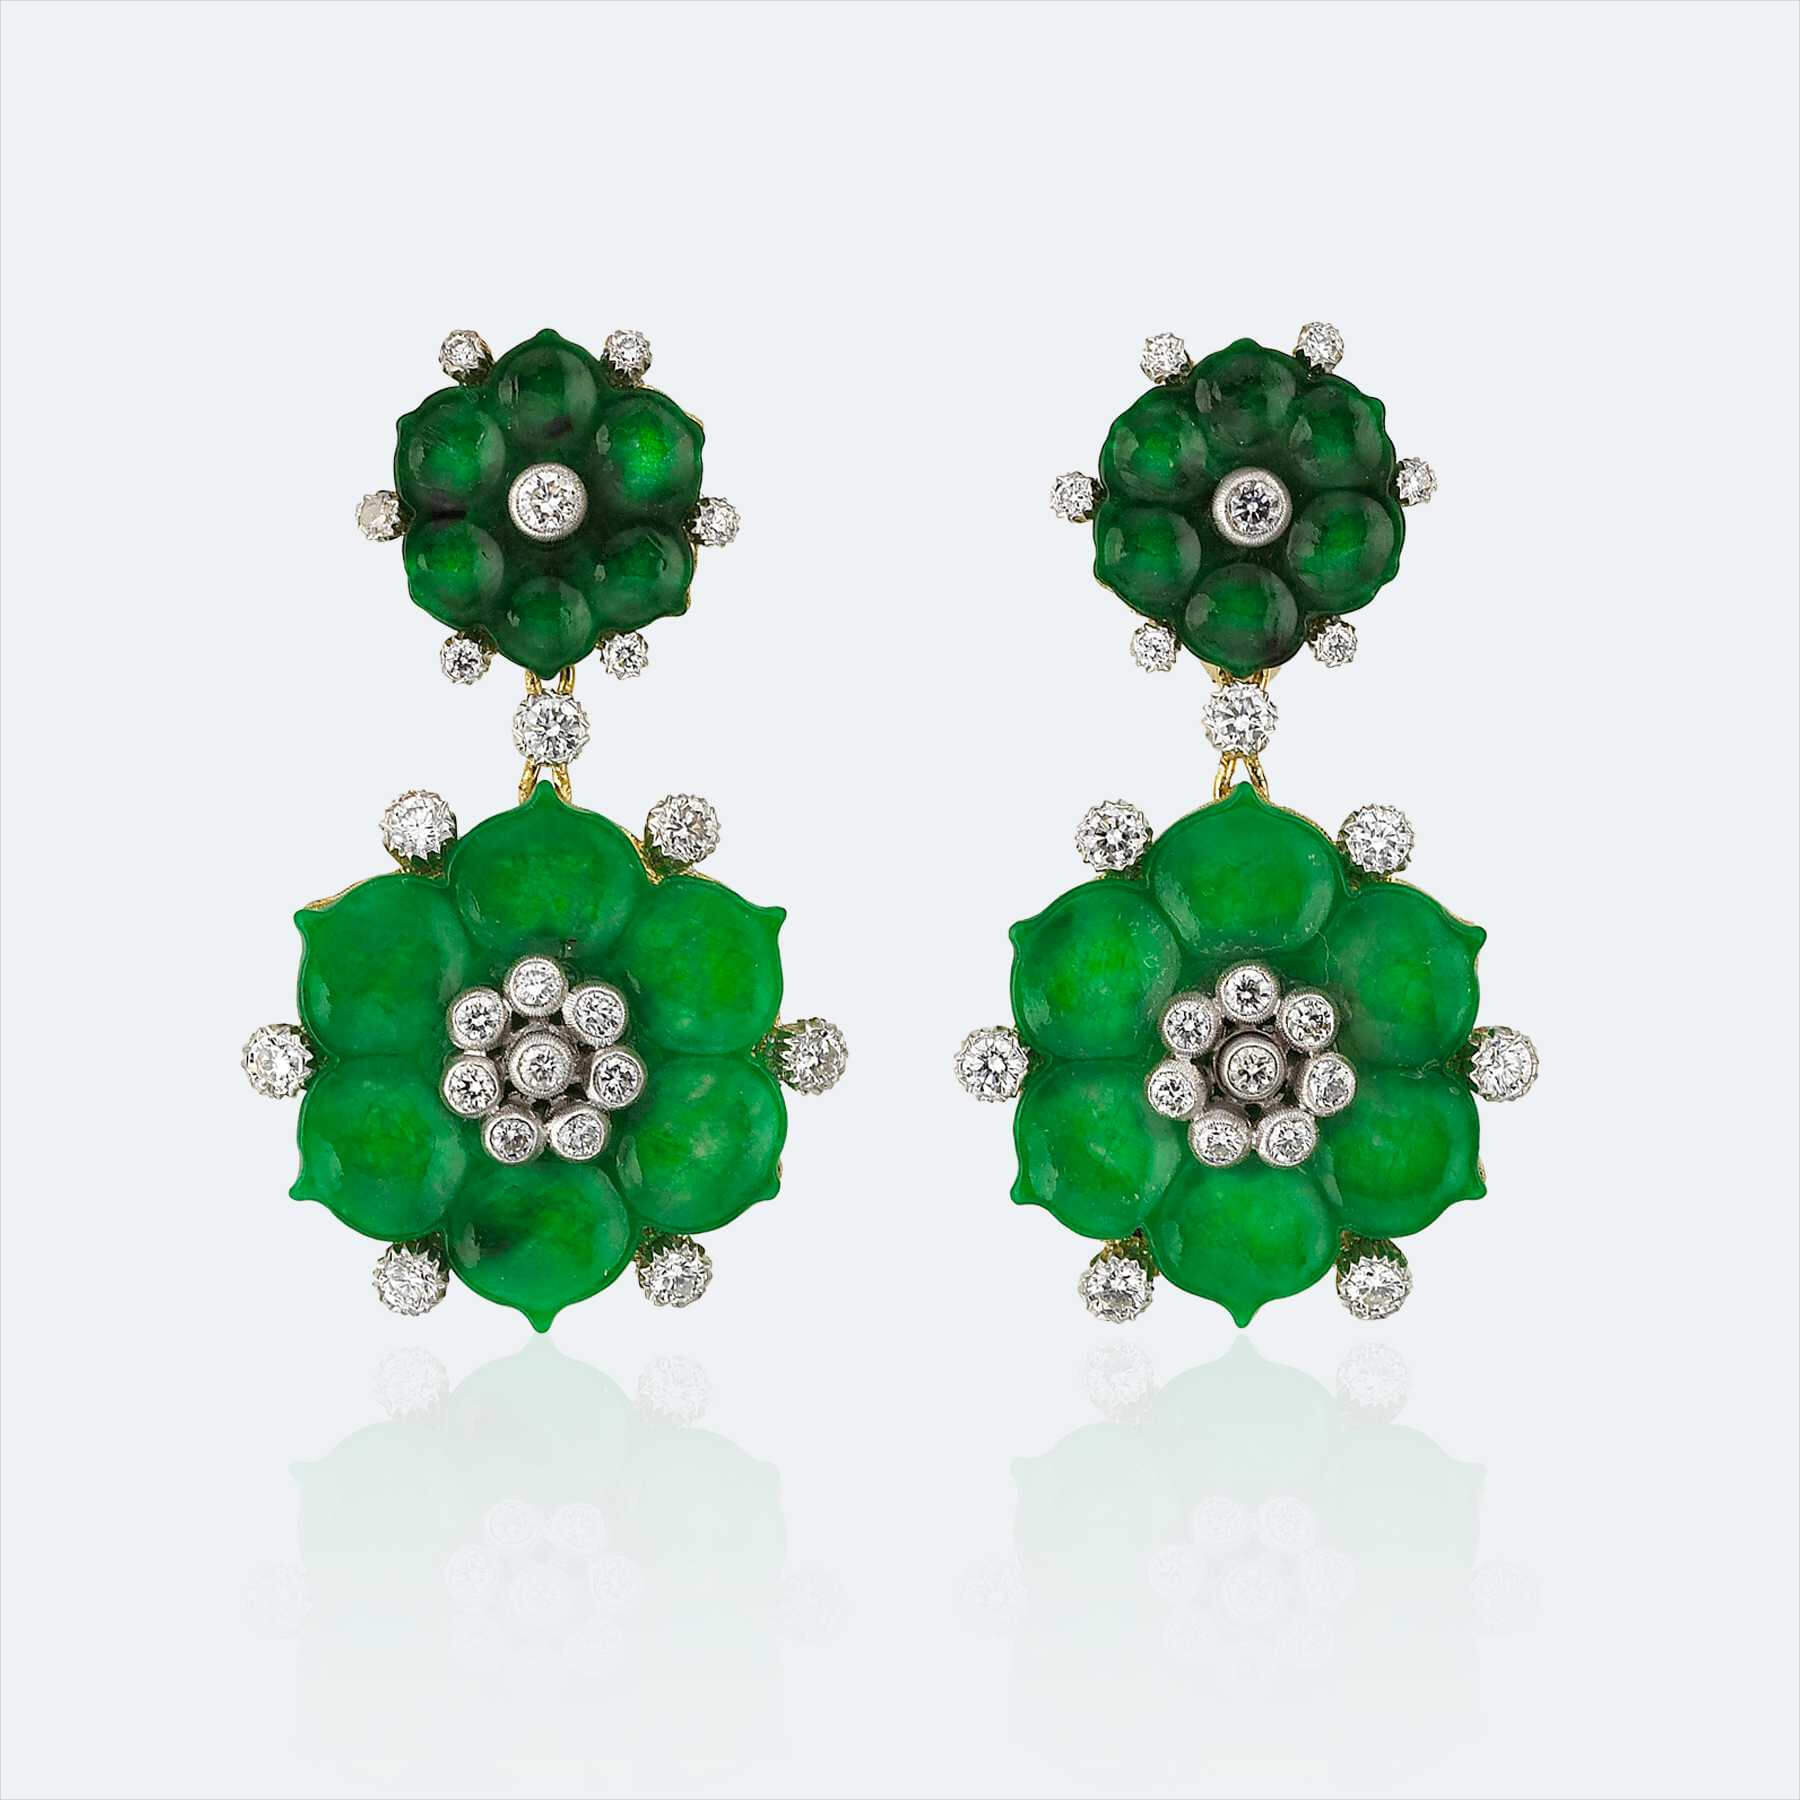 fiore verde pendant earrings 1